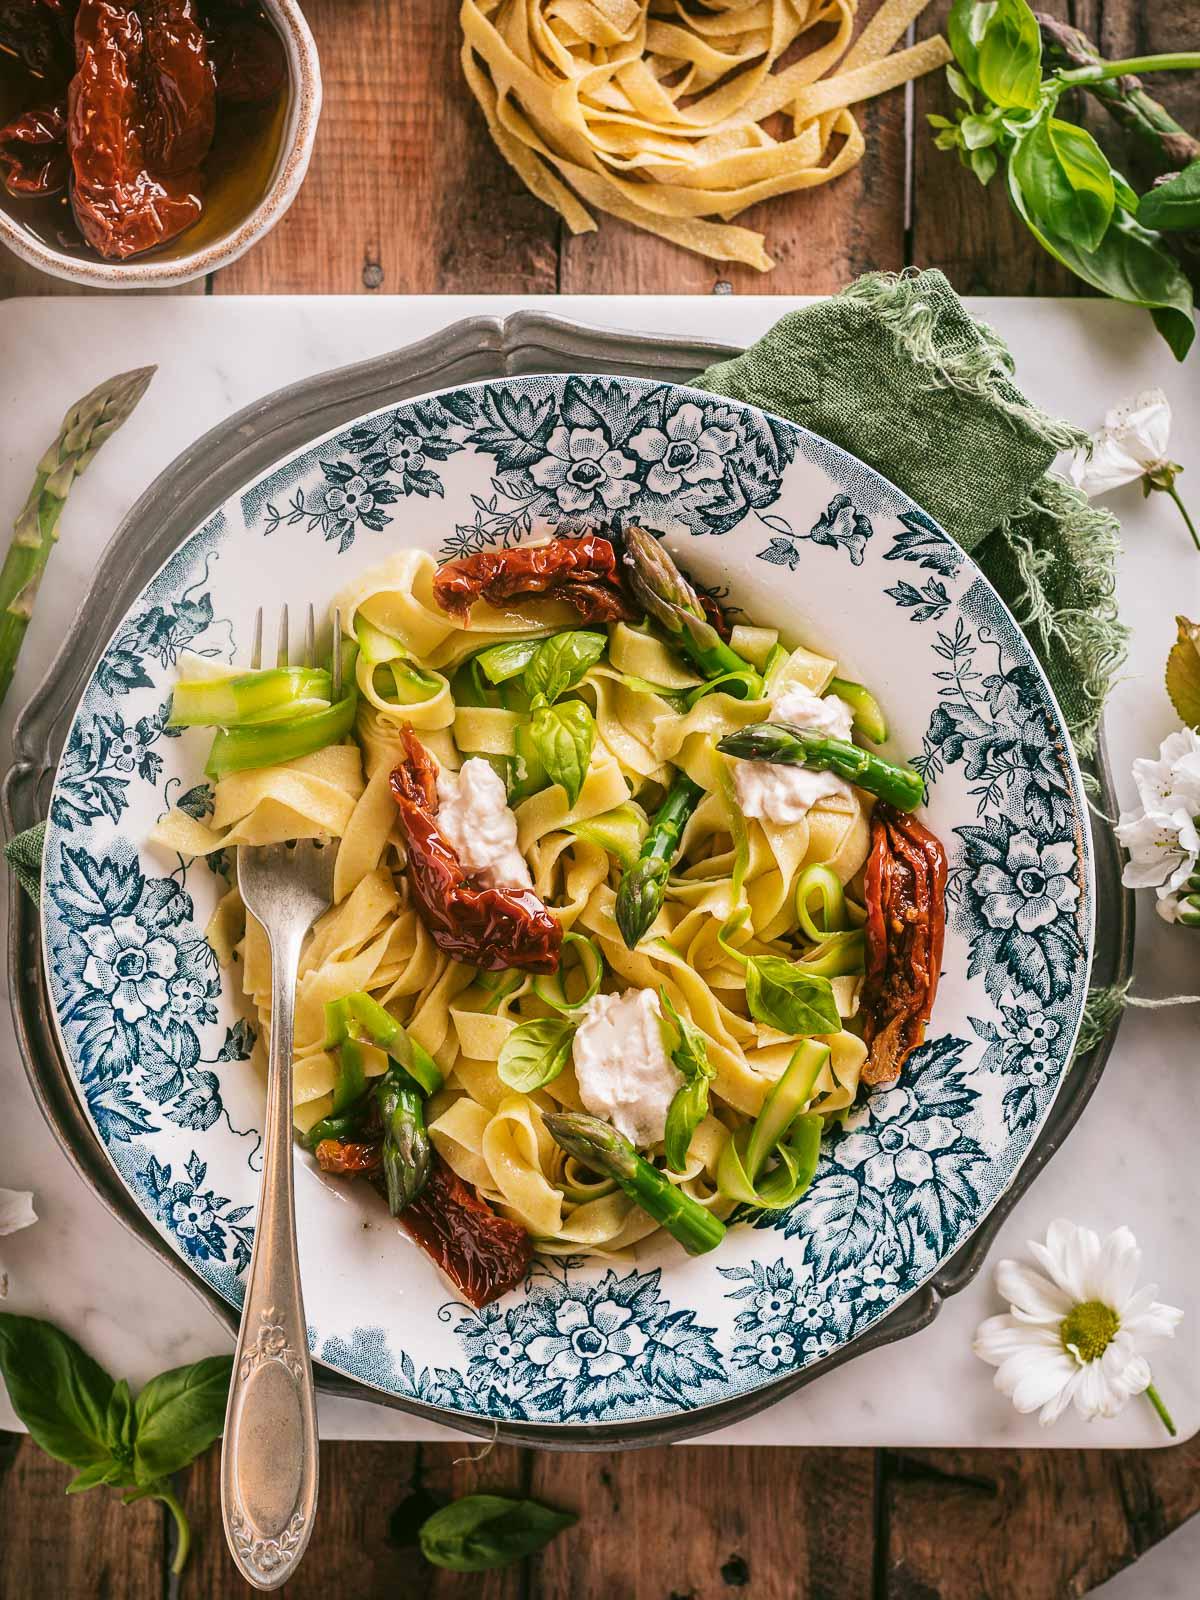 Tagliatelle vegan agli asparagi pasta fresca vegan asparagus tagliatelle menu di pasqua tagliatelle primaverili